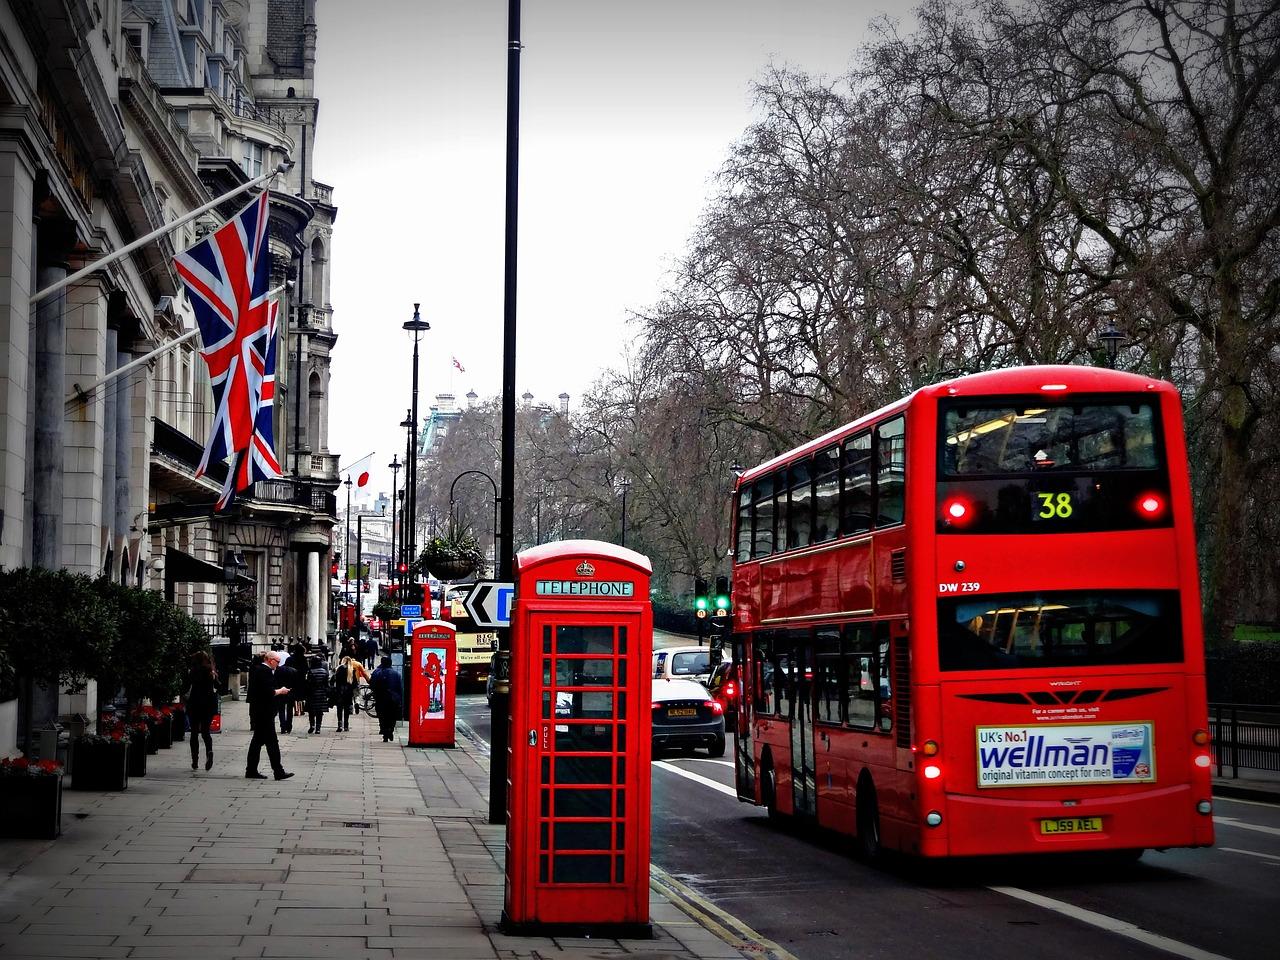 A double decker driving down a London street.